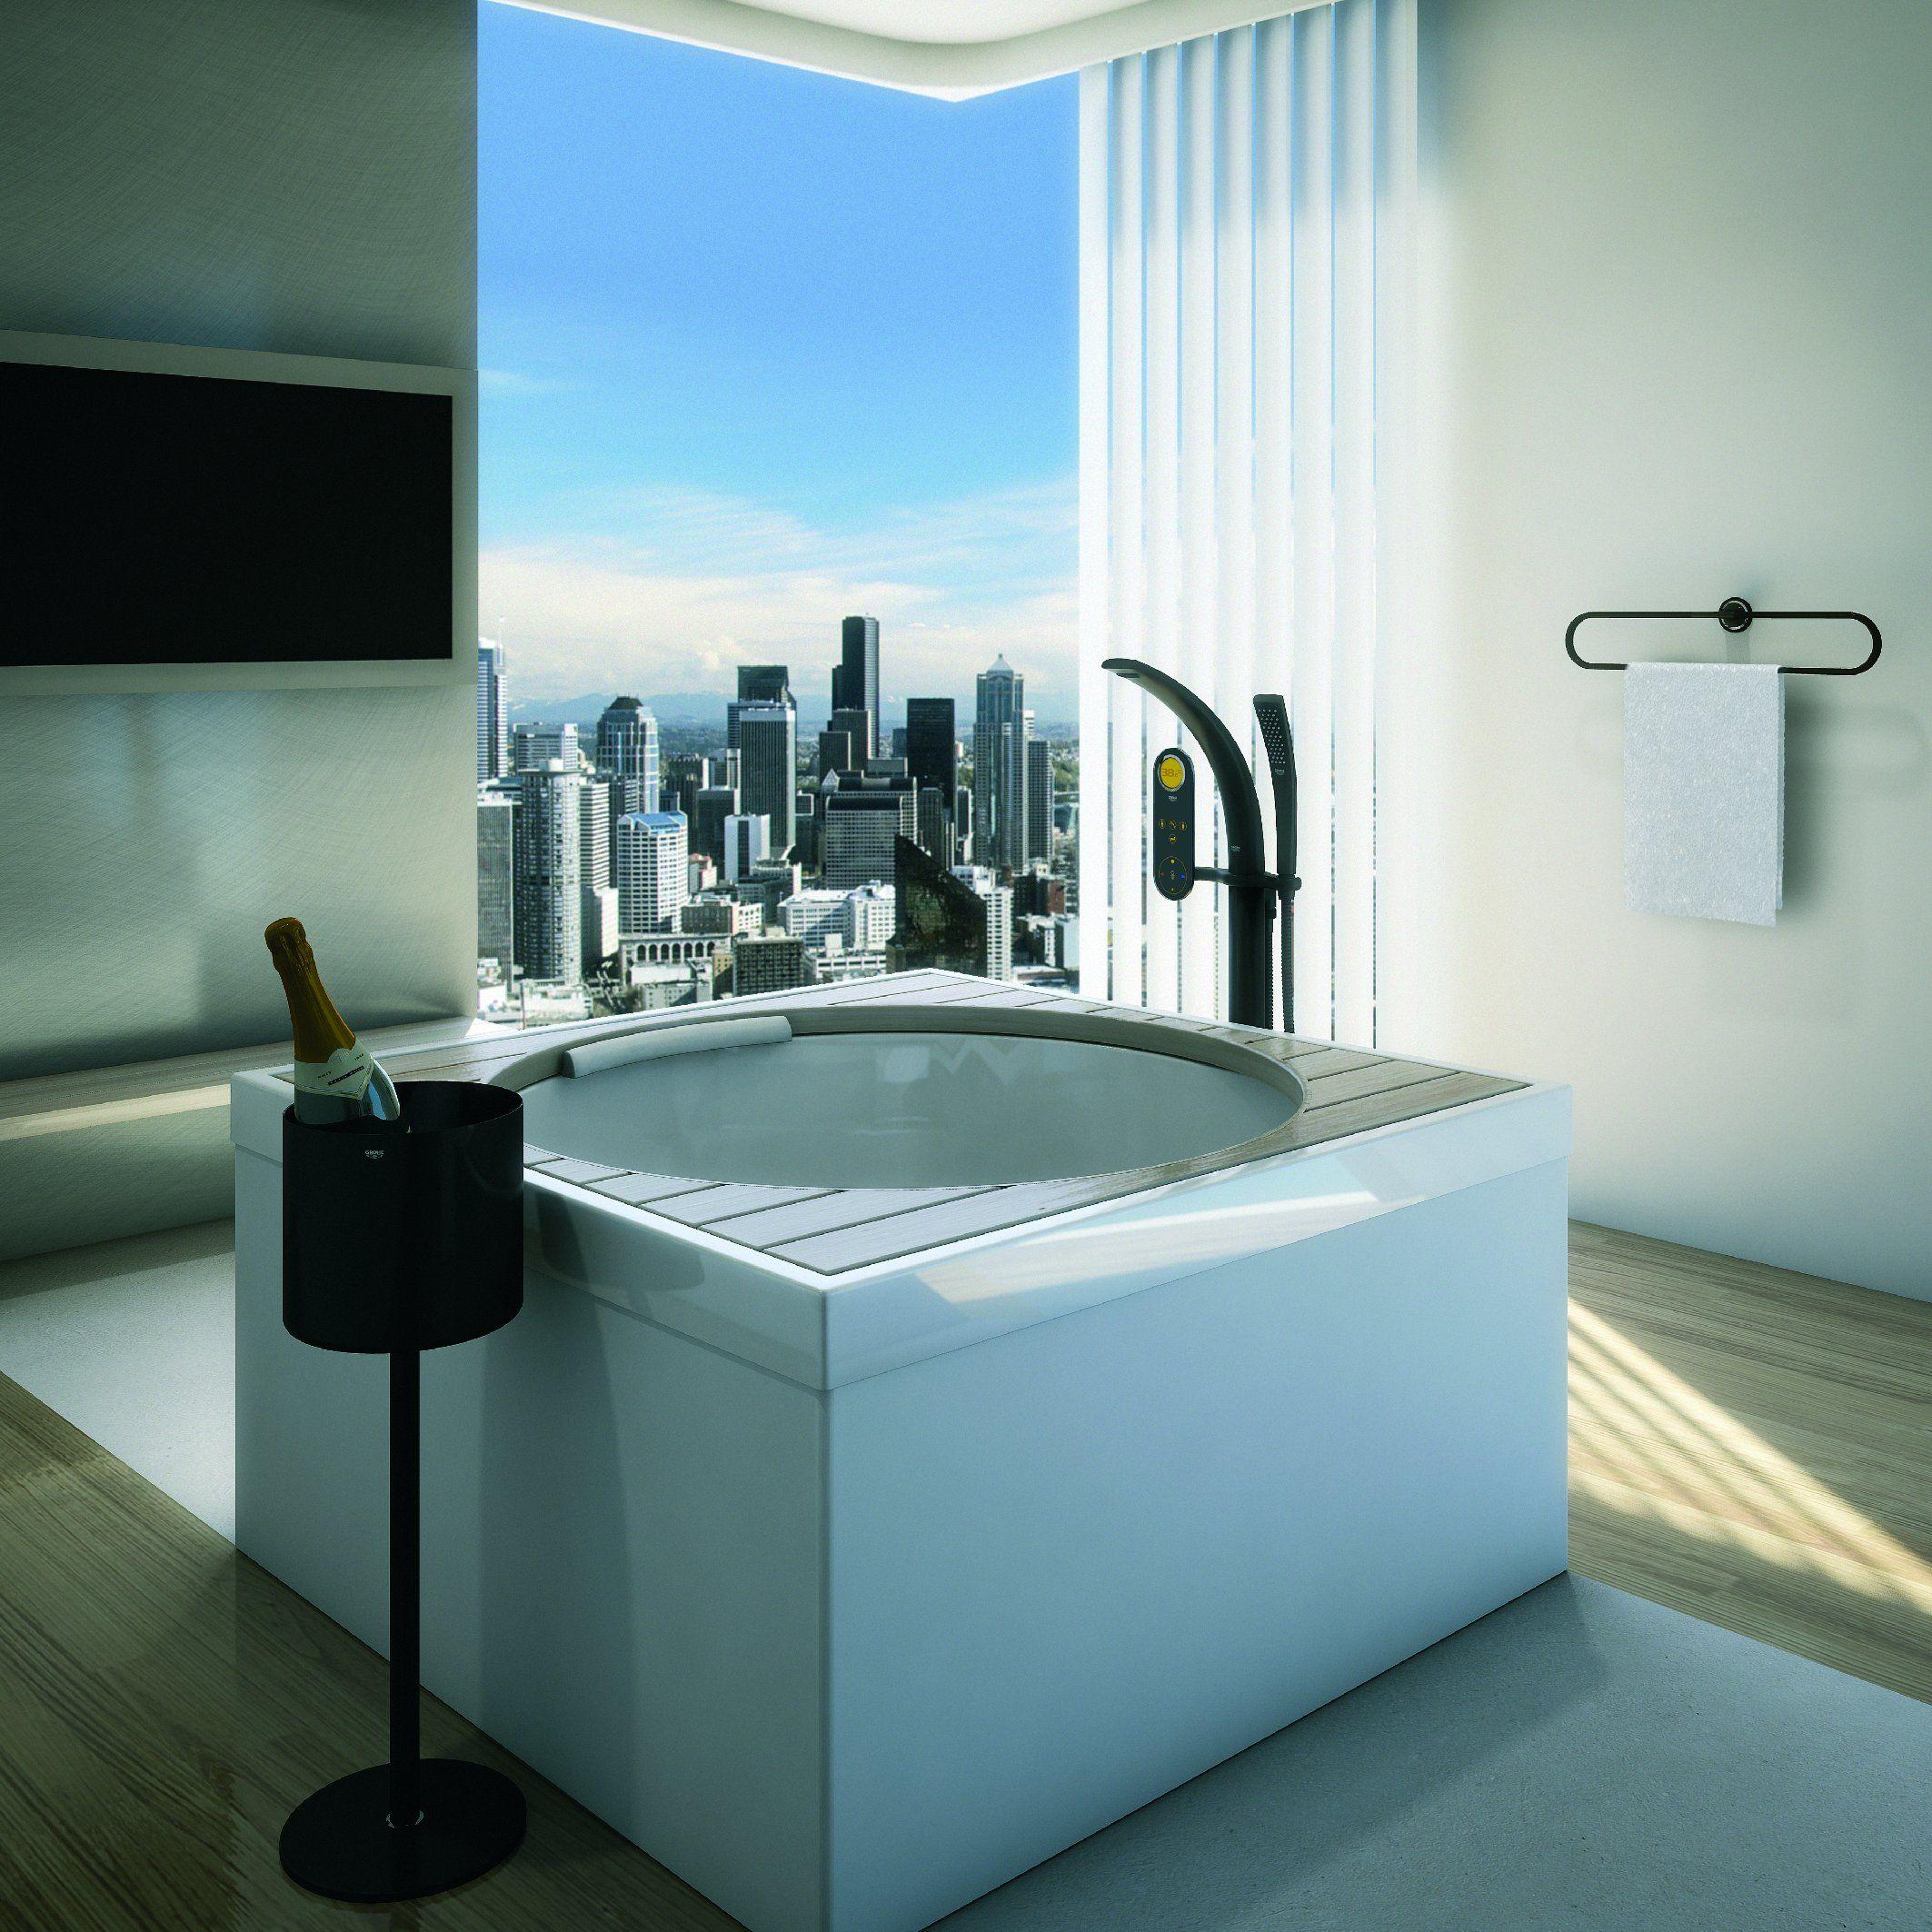 Amazing bathtub by Grohe | Hardware | Pinterest | Bathtubs, Medicine ...